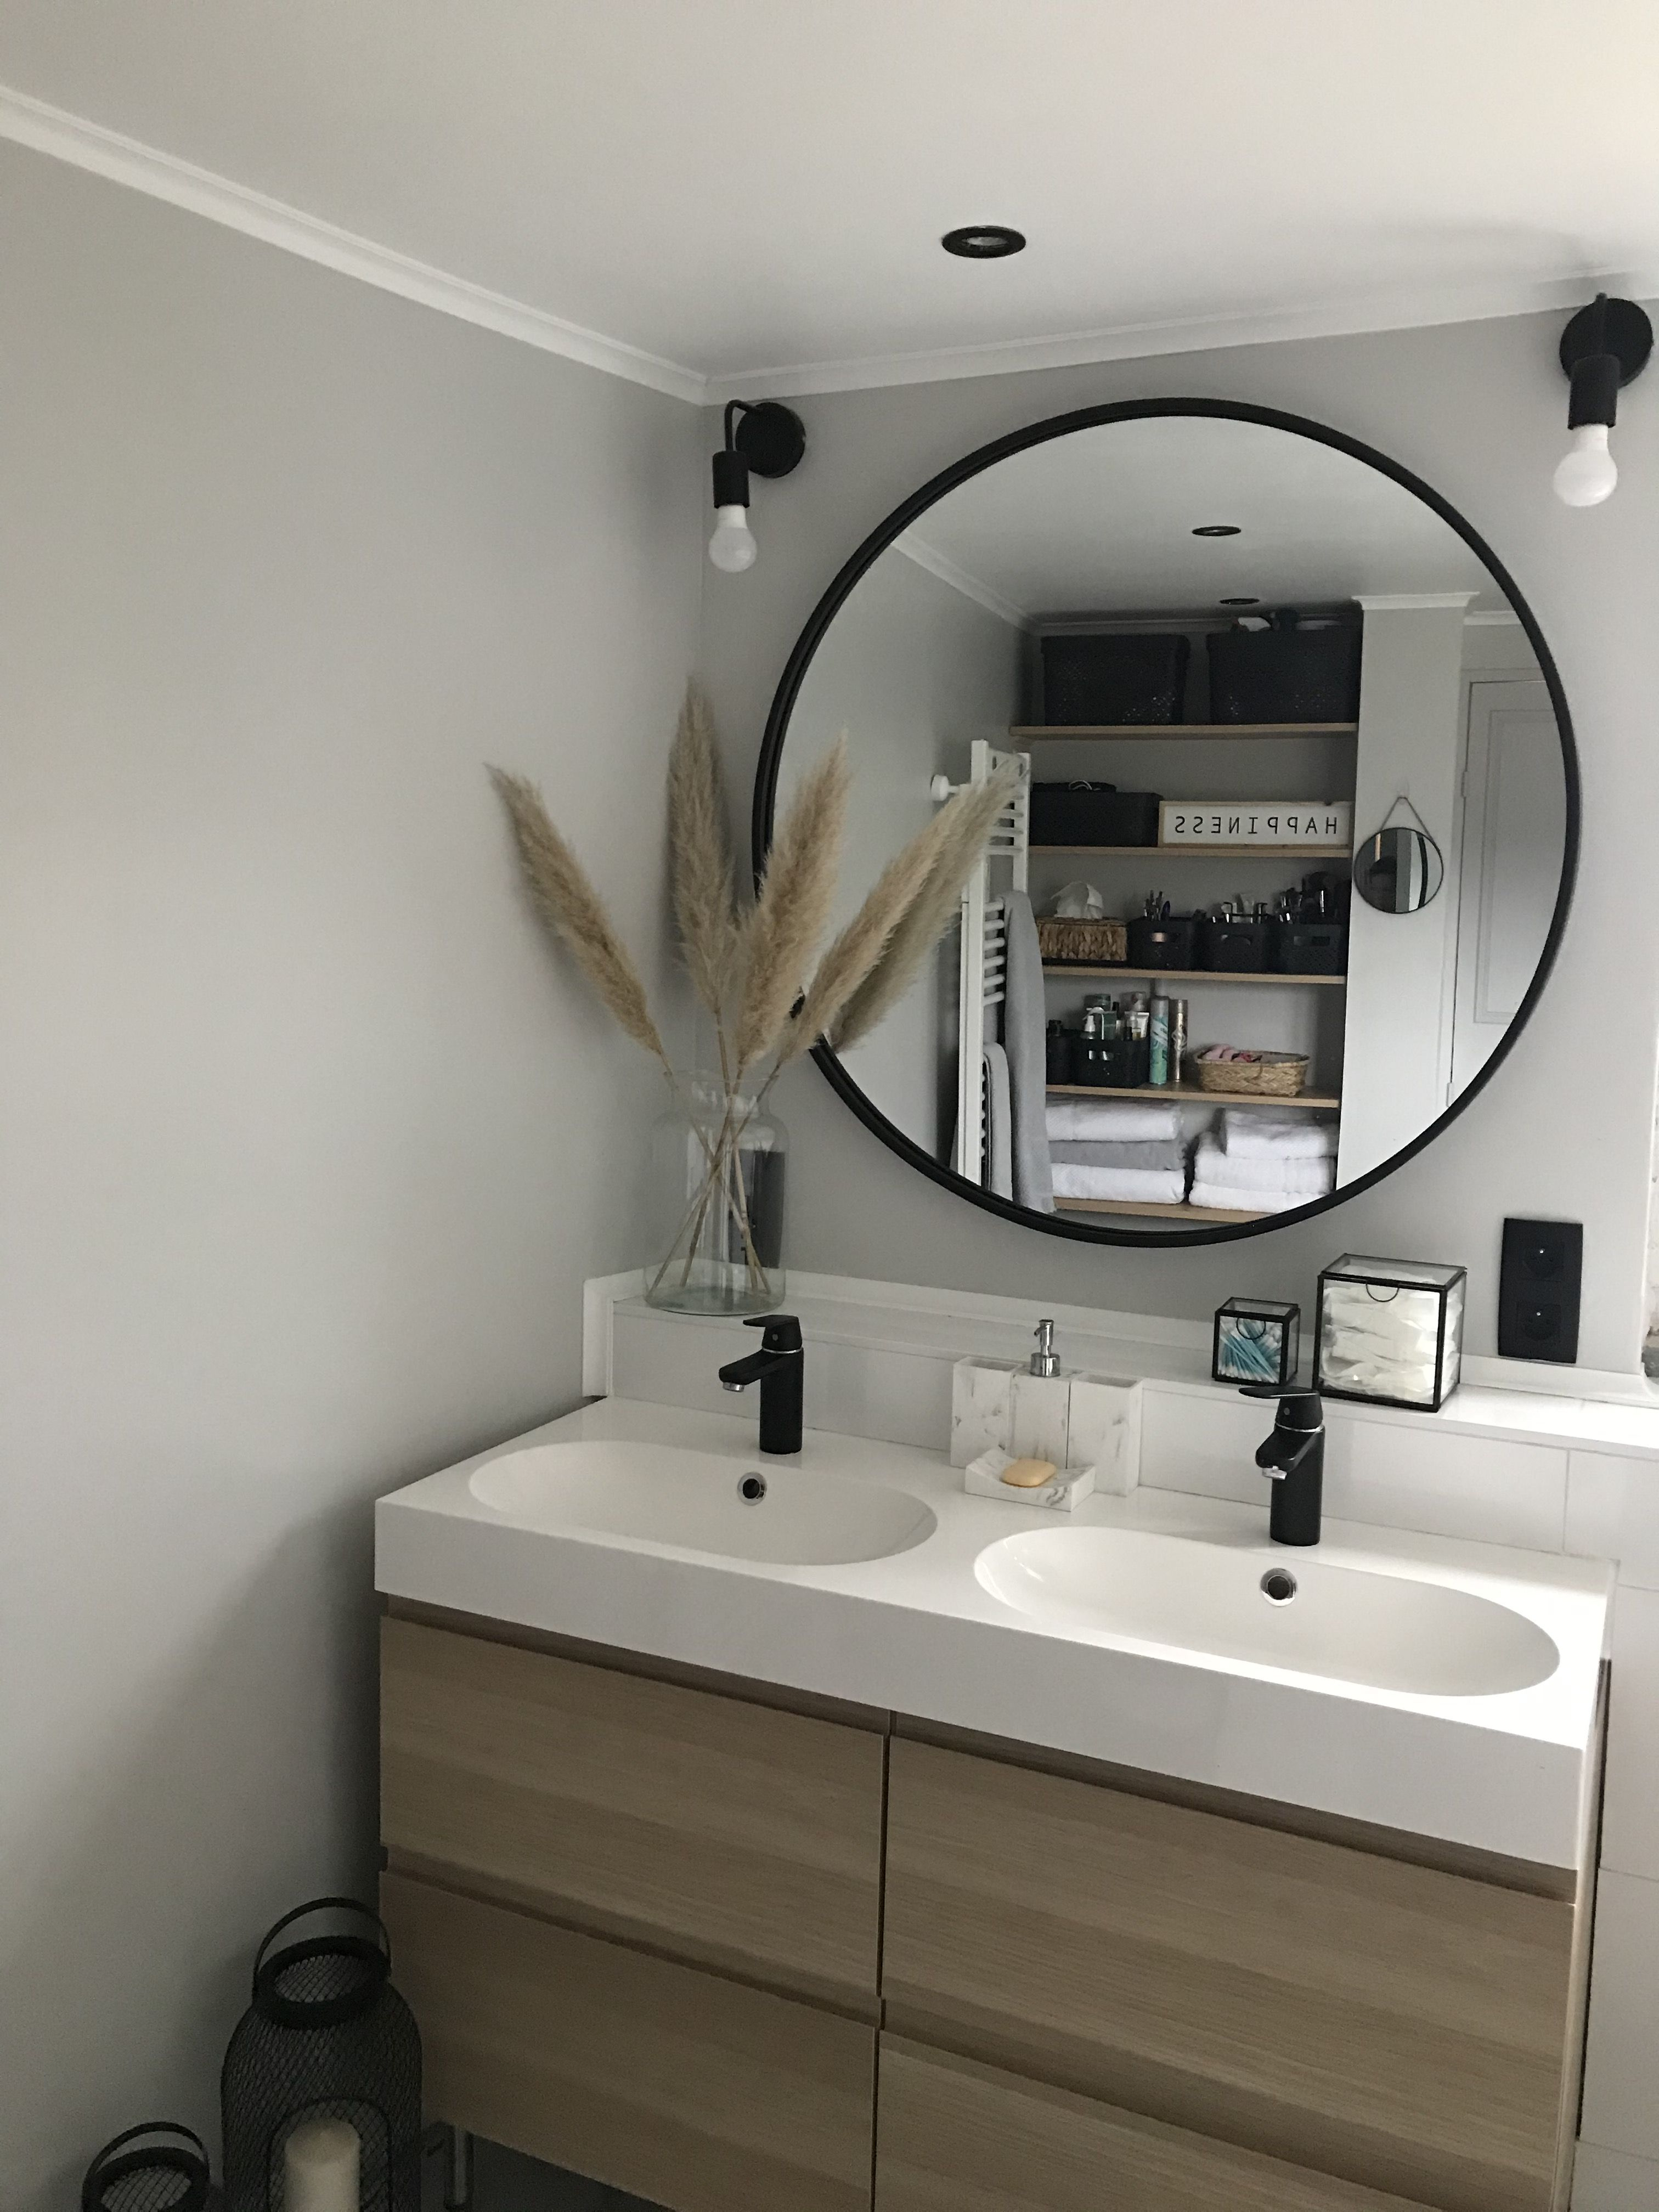 13+ Miroir rond salle de bain leroy merlin ideas